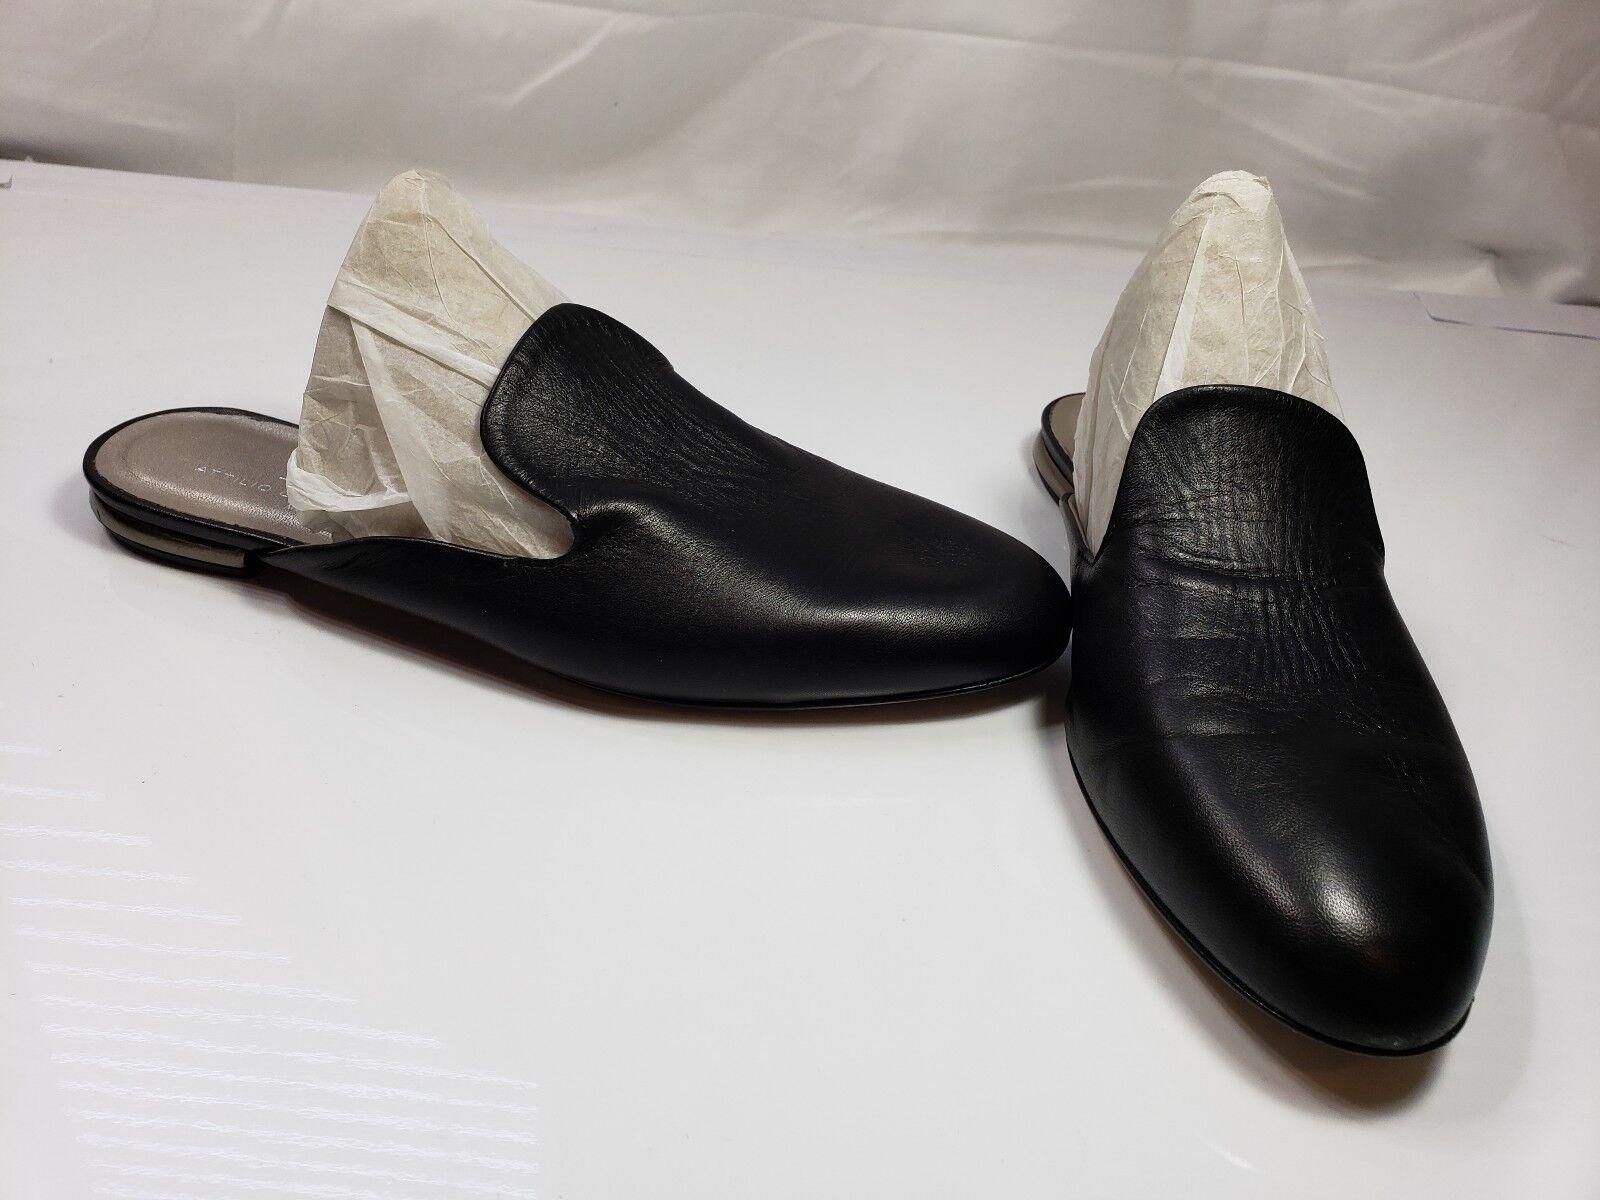 NWOB Attilio Giusti Leombruni Flat Mule Black Leather sz. Flat sz. Leather 38/US 8 MSRP $320 96c9d7